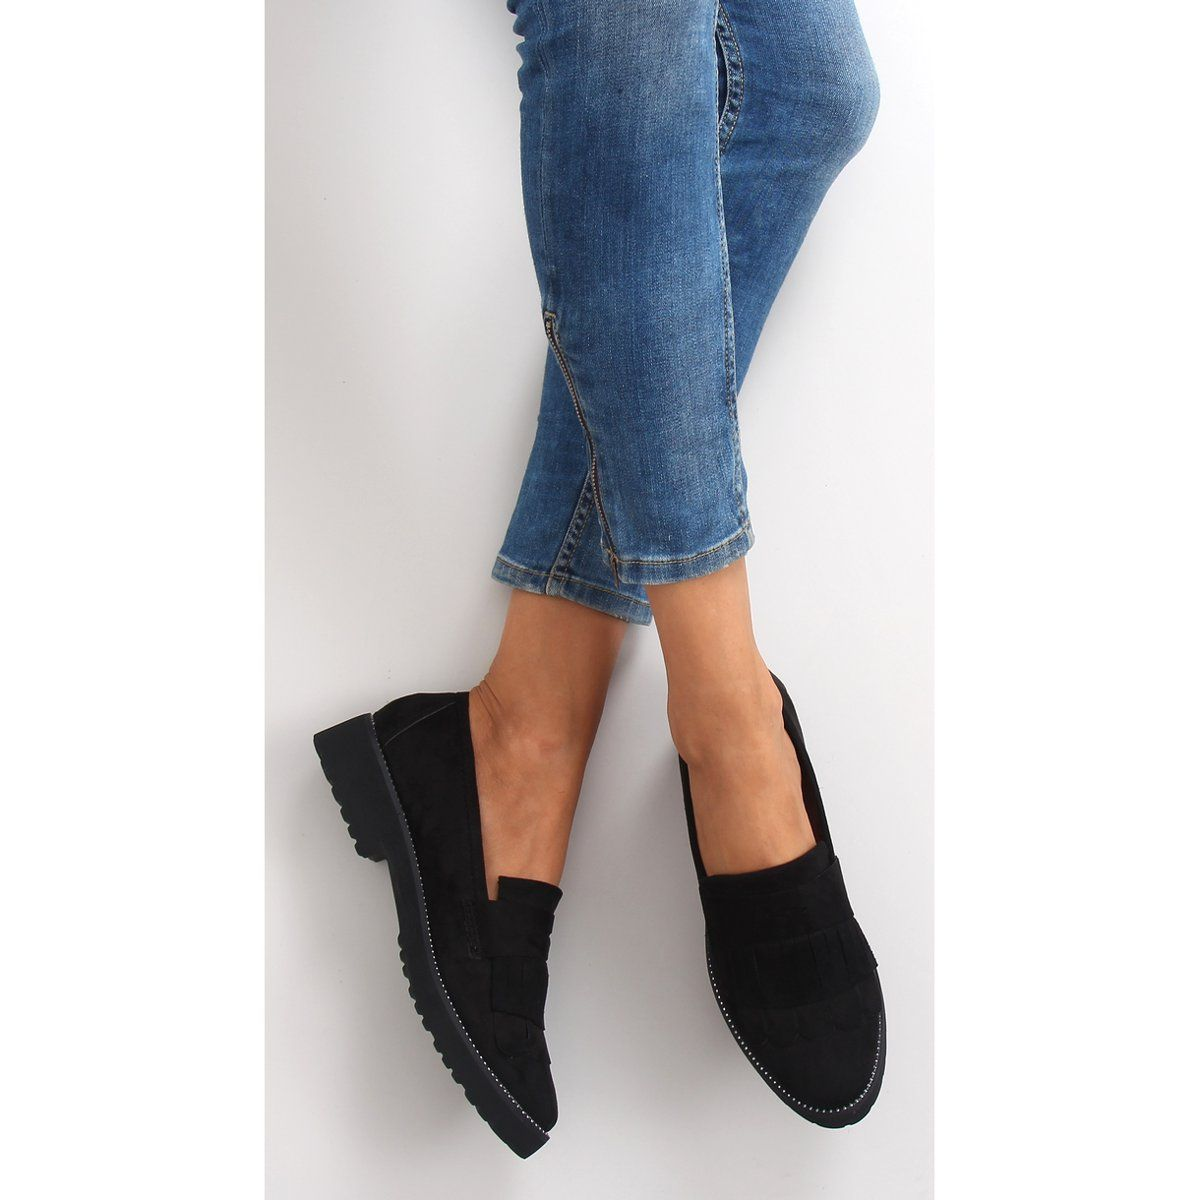 Mokasyny Damskie Wysoka Podeszwa F173p Black Czarne High Heel Shoes Shoes Shoes Heels